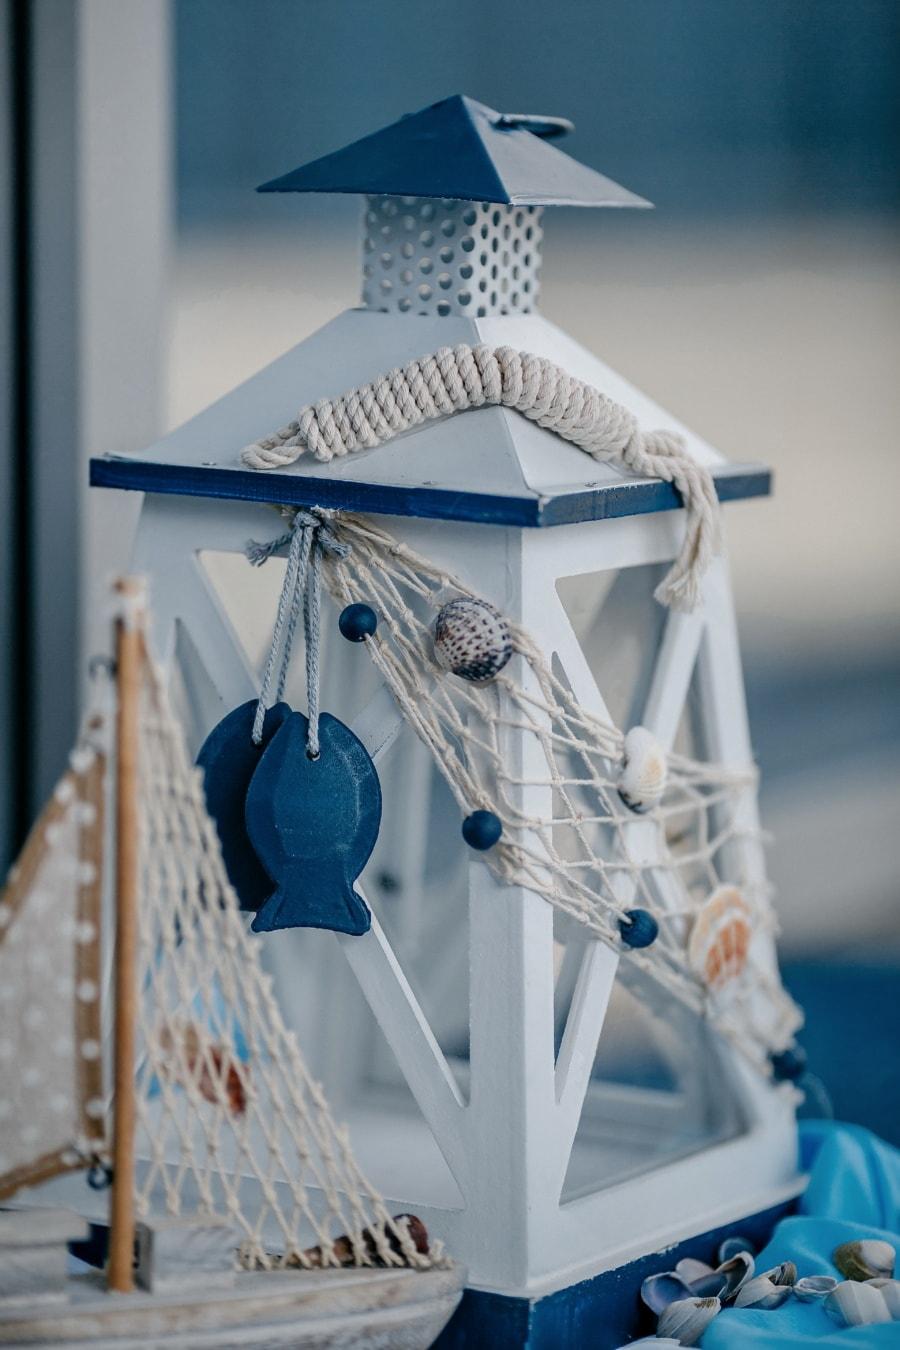 Laterne, Blau, aus Holz, handgefertigte, Dekoration, Seil, Holz, Miniatur, Detail, Knot